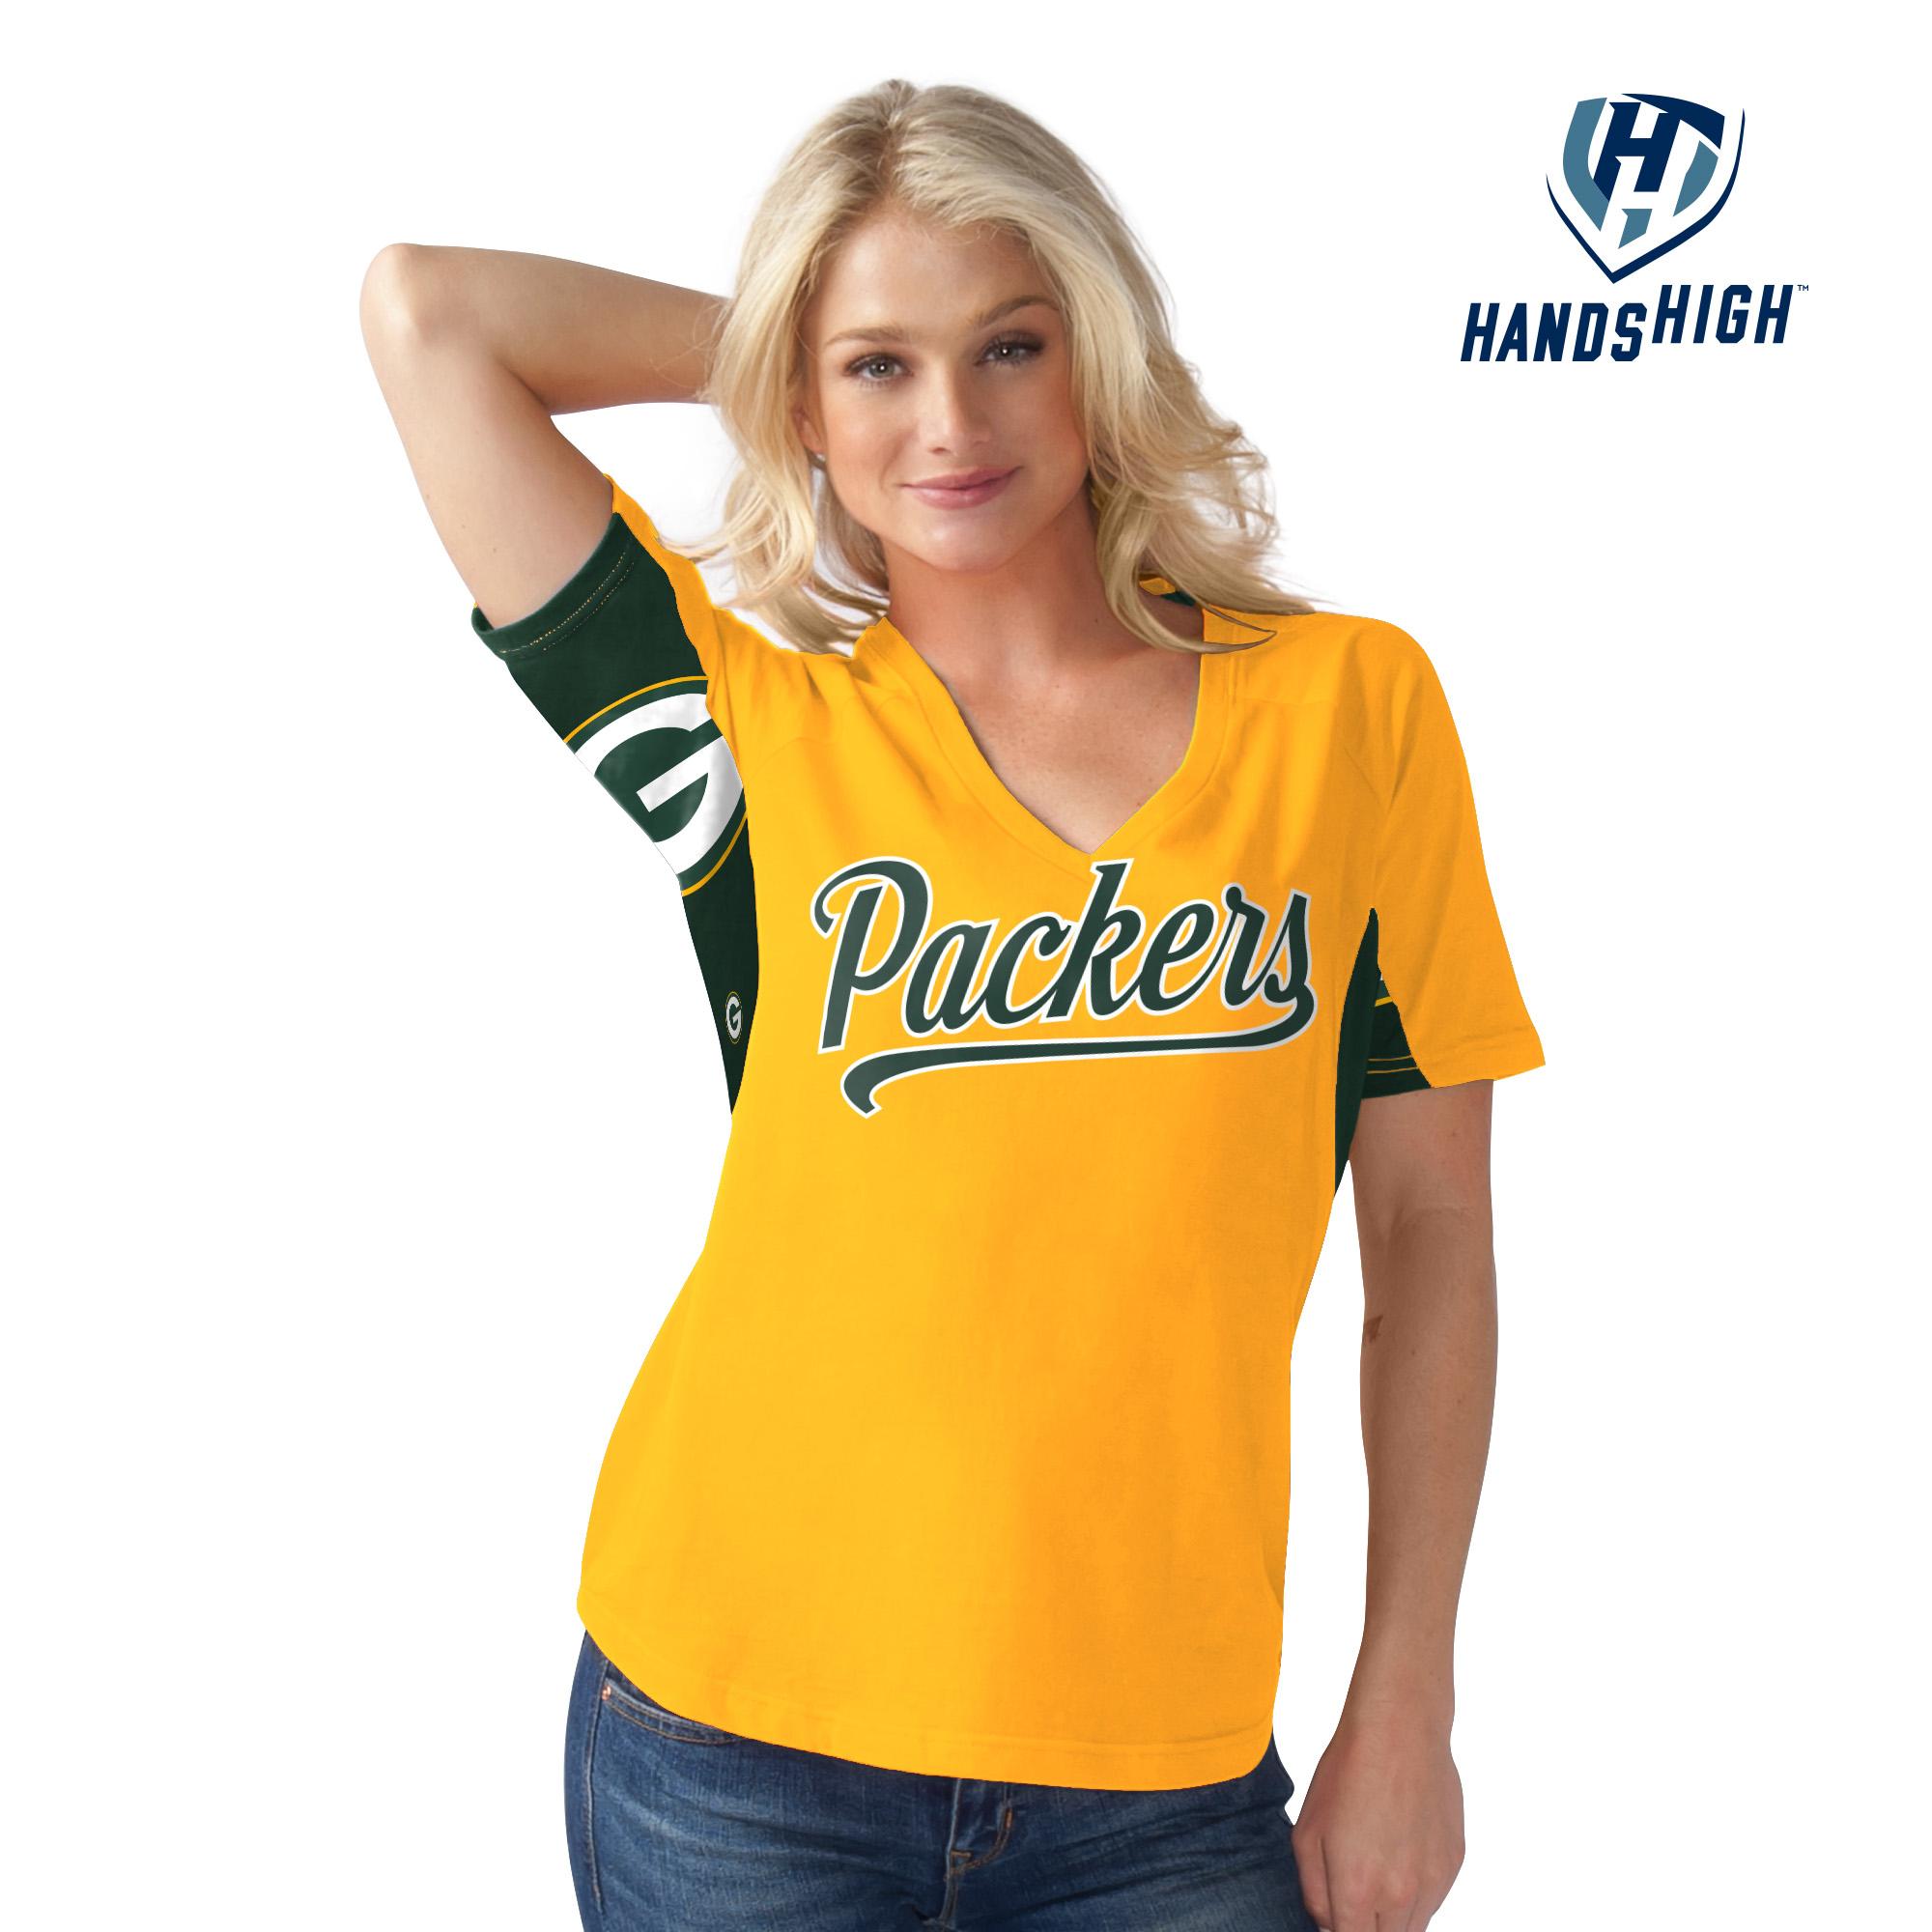 G-III Green Bay Packers Hands High On The Board Women's Shirt